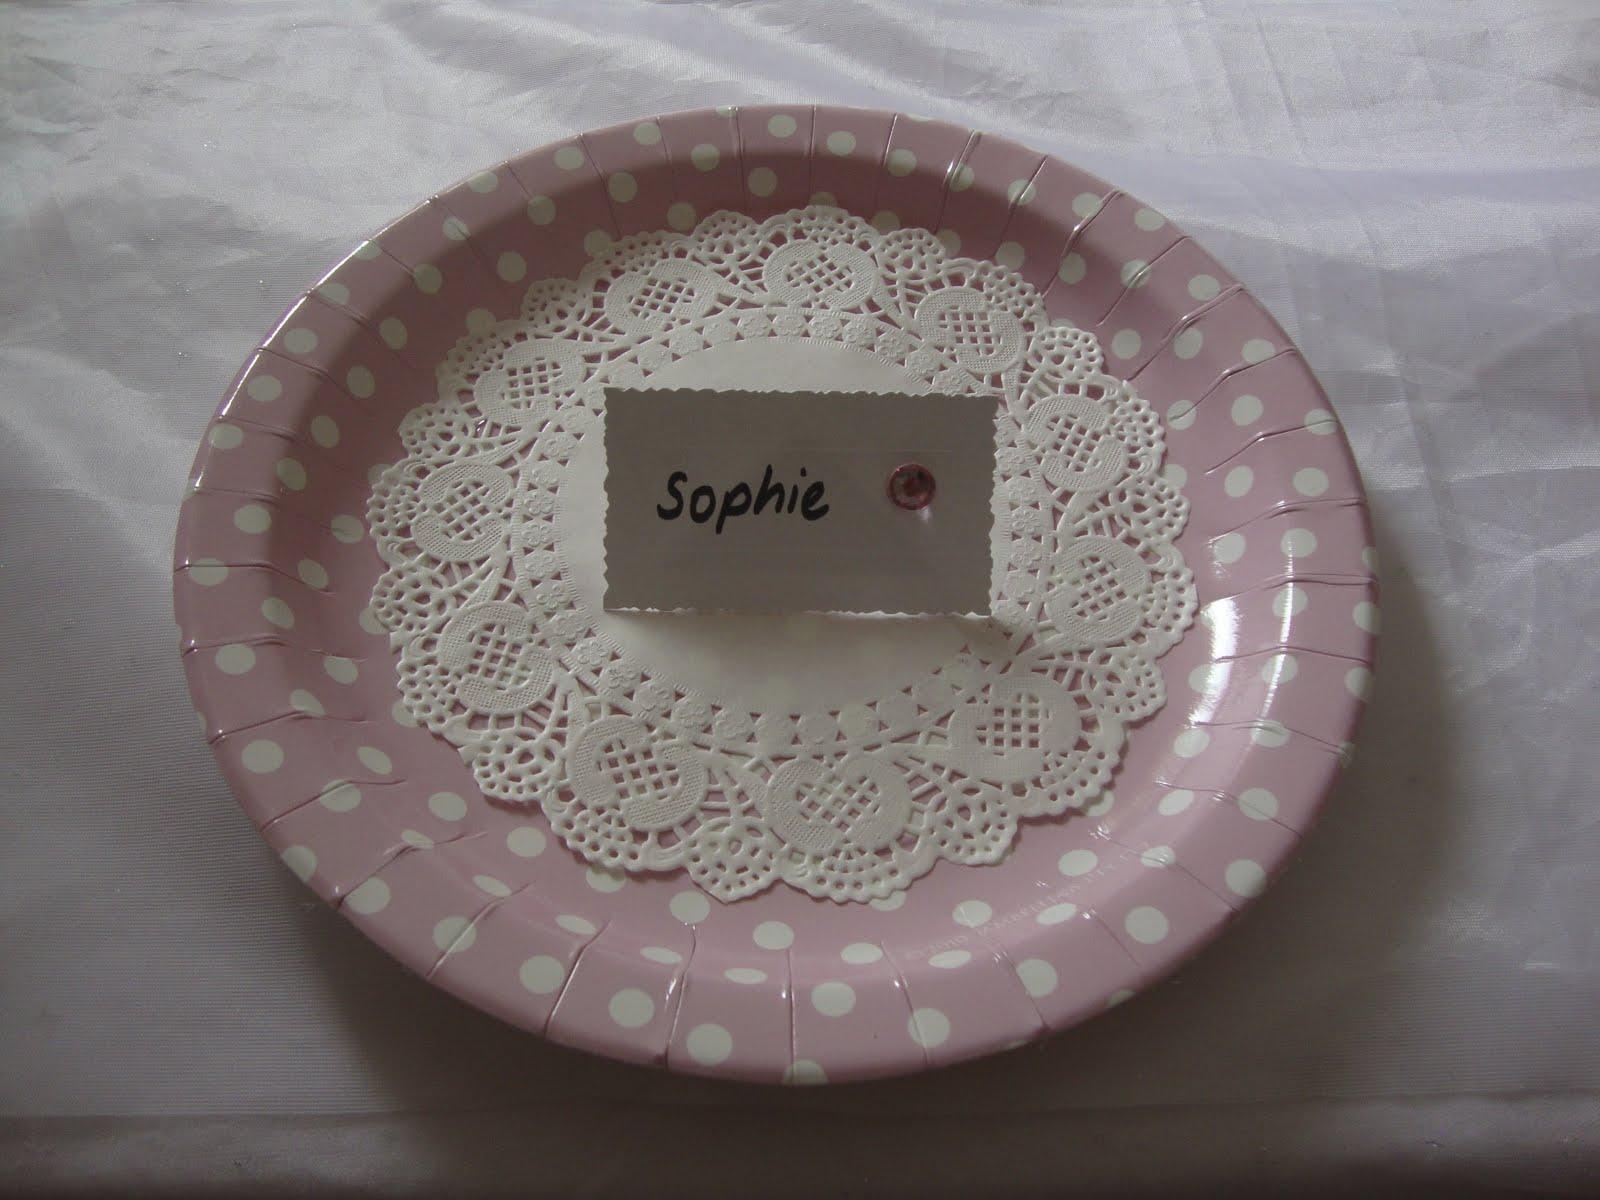 http://2.bp.blogspot.com/-pADLi-sIPKo/TewXEpxTwgI/AAAAAAAABCE/UmasXE7oPEo/s1600/place+card.jpg